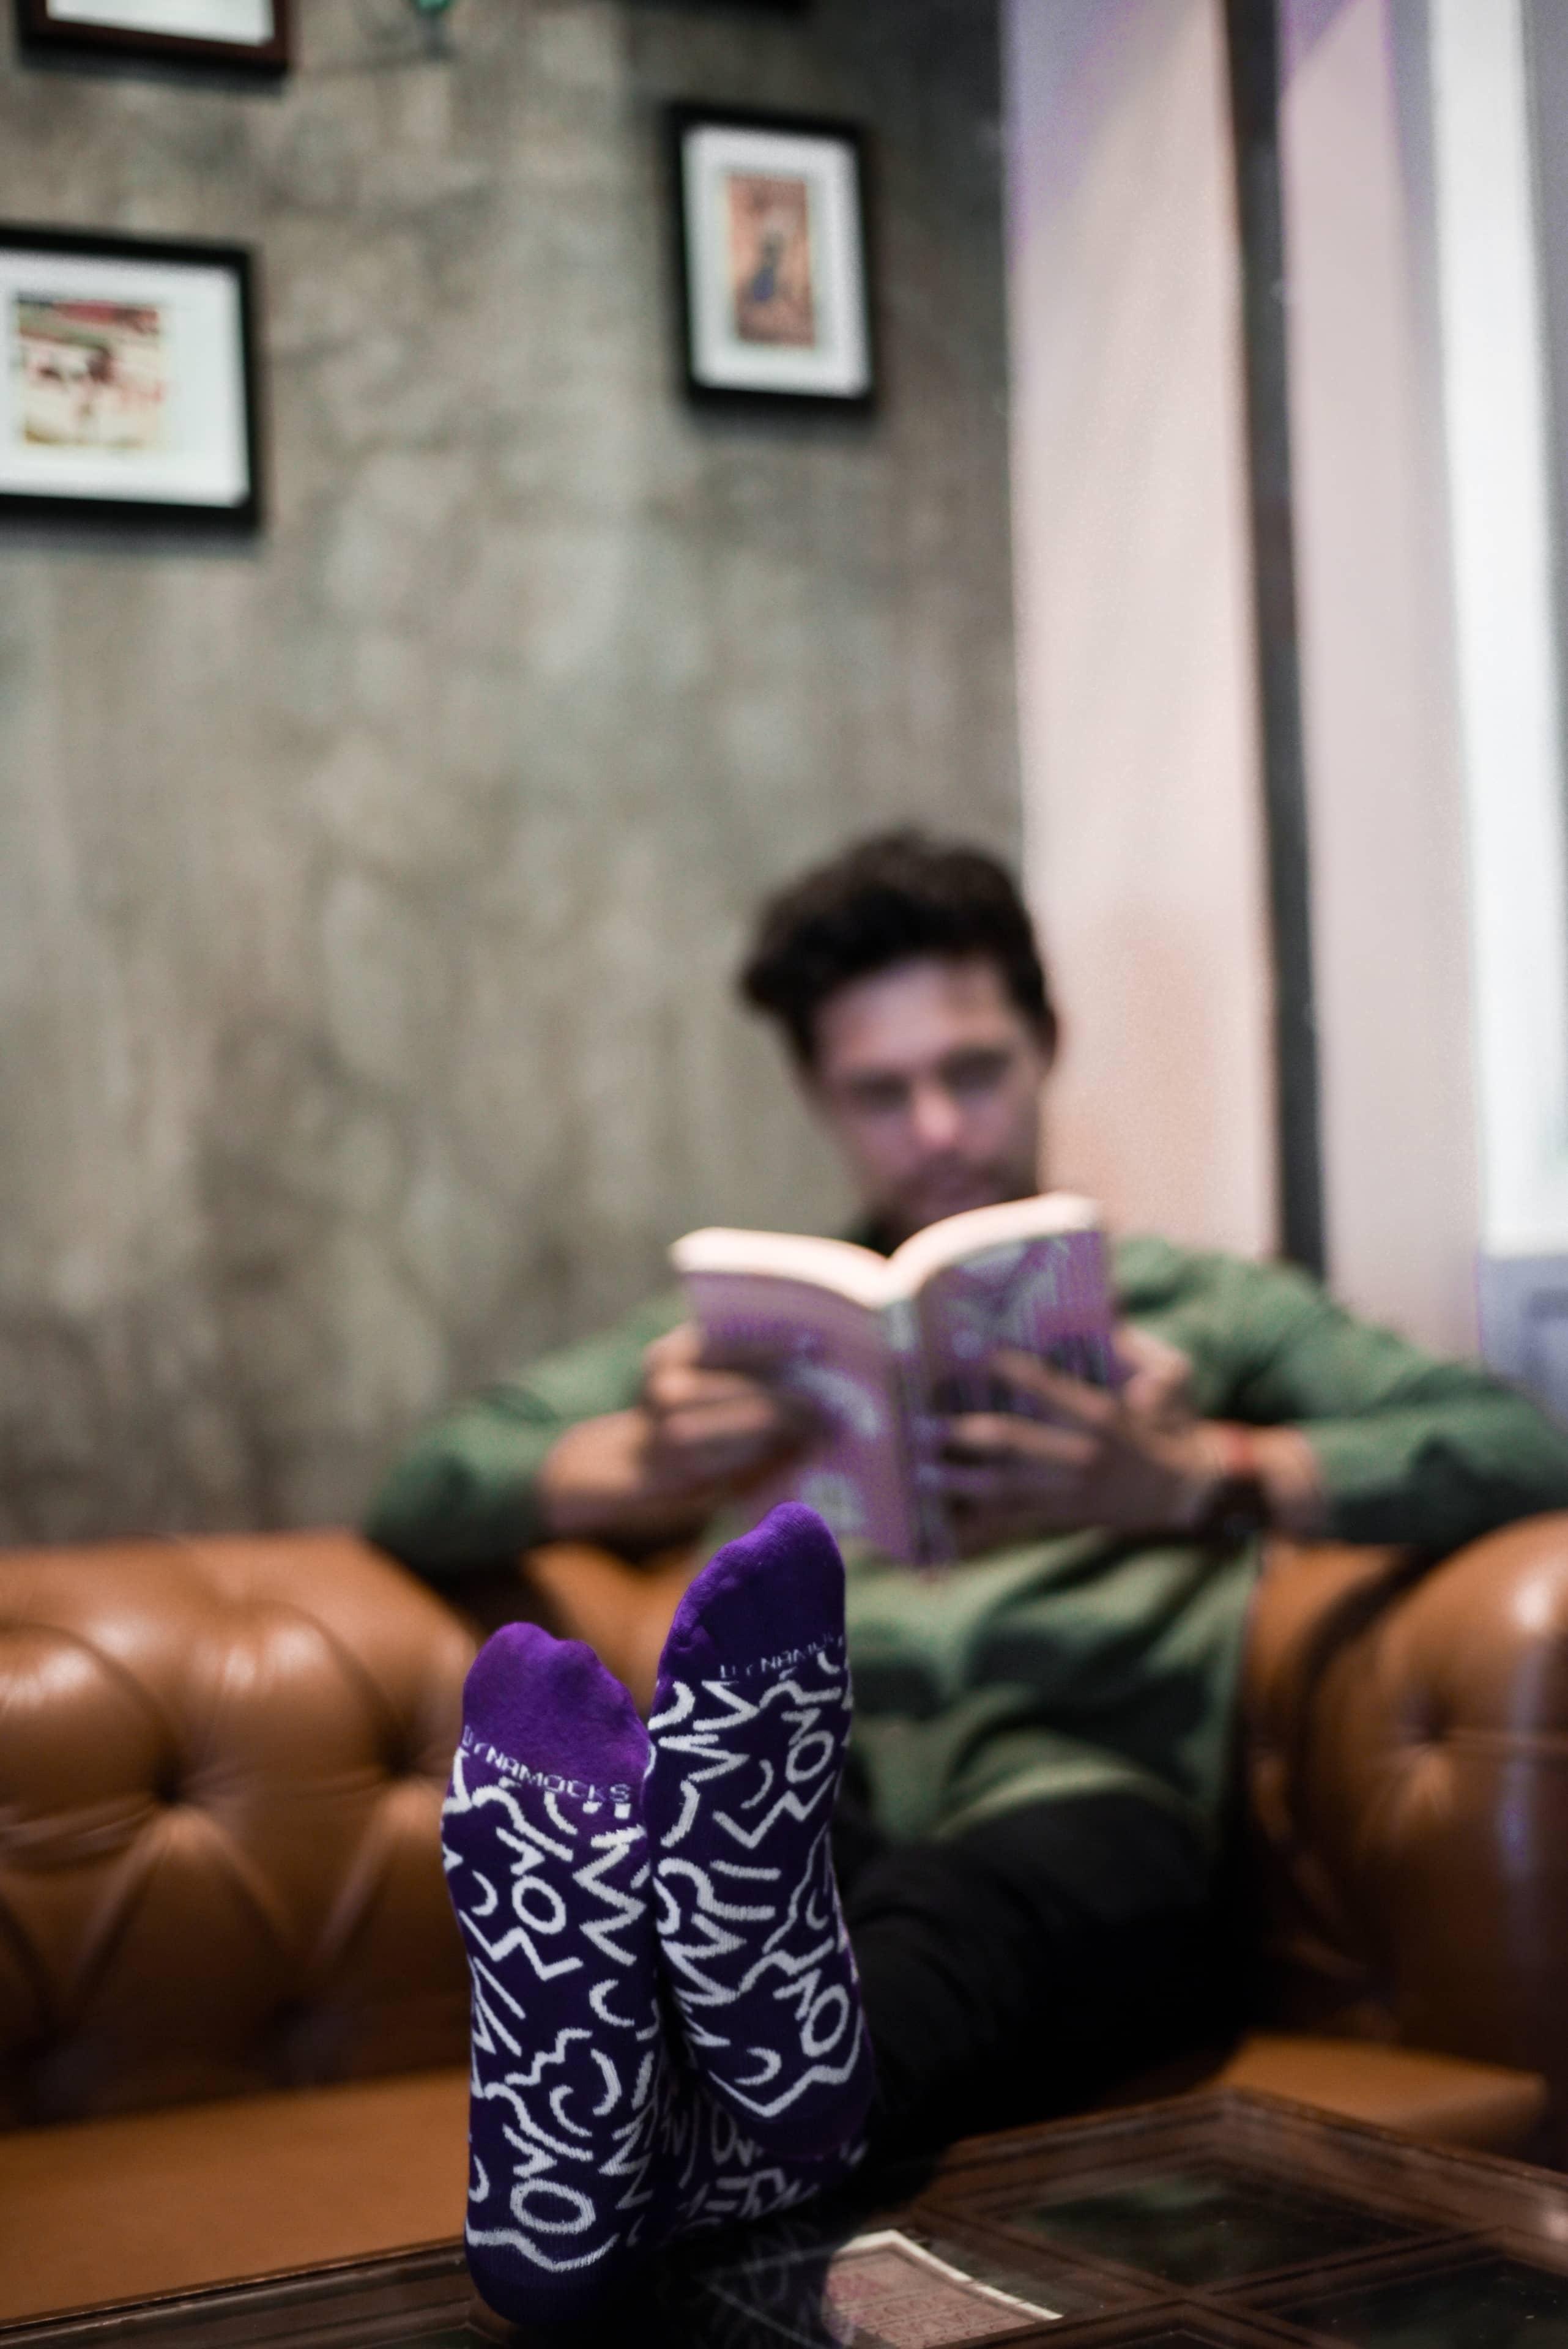 Dynamocks Doodle socks for men & Women